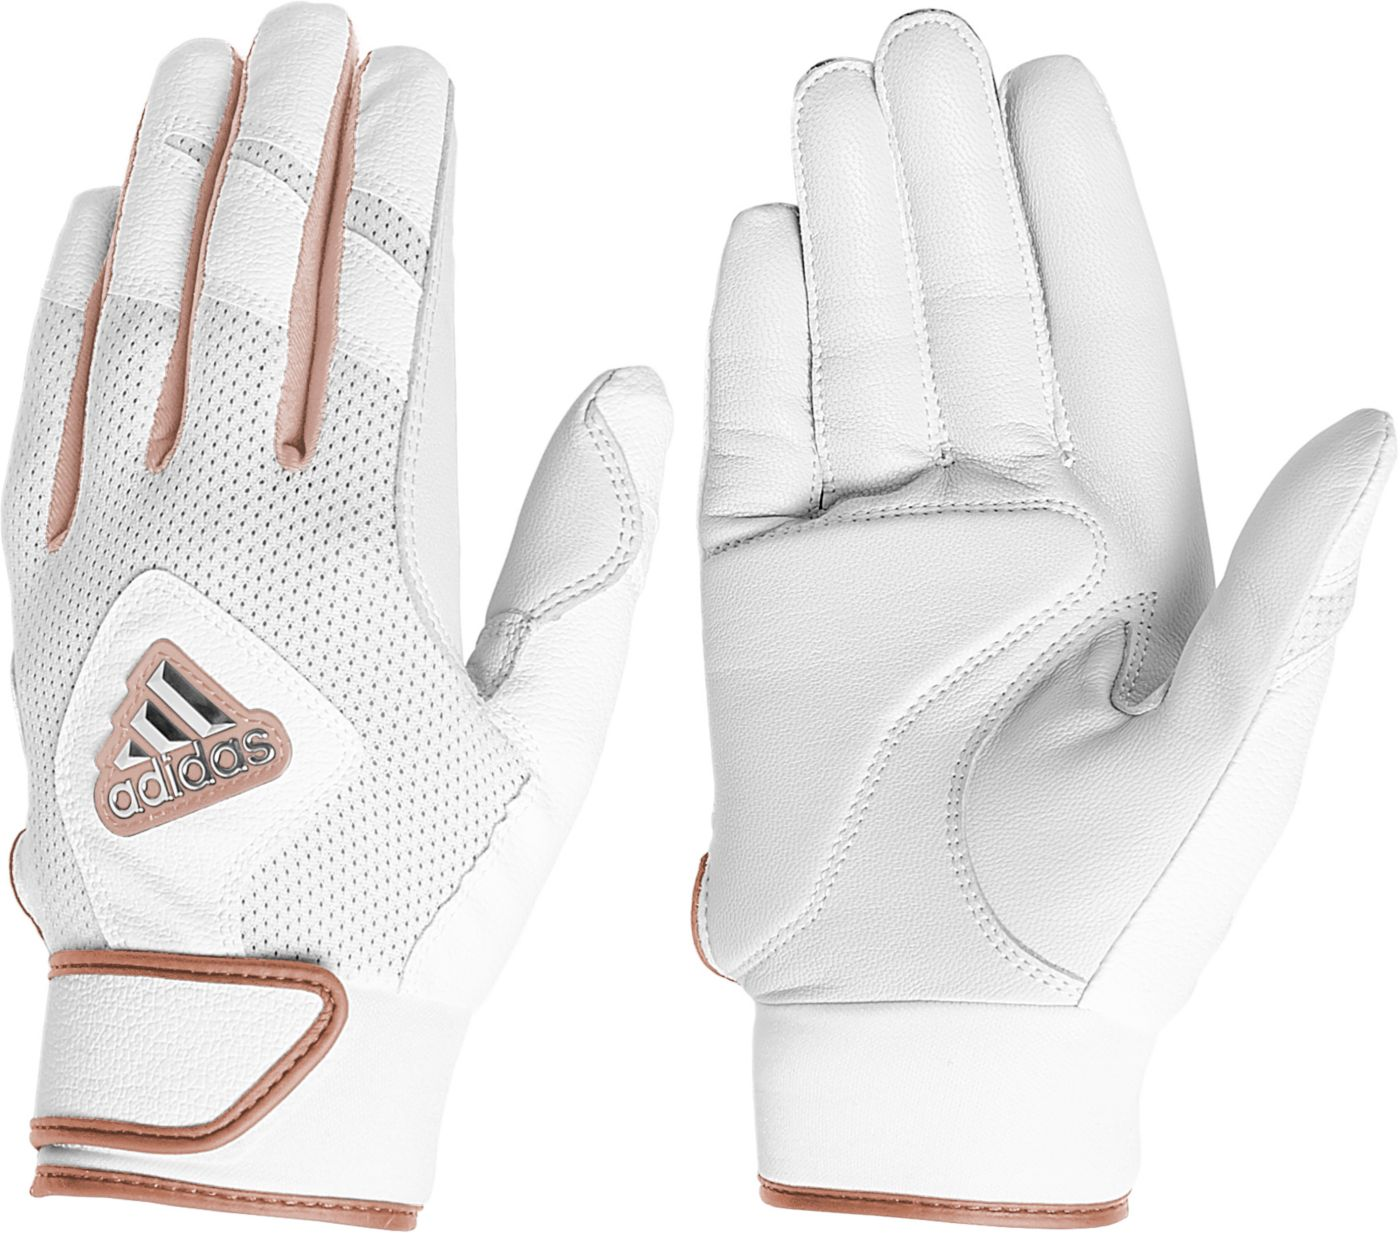 adidas Women's Fastpitch Batting Gloves 2020